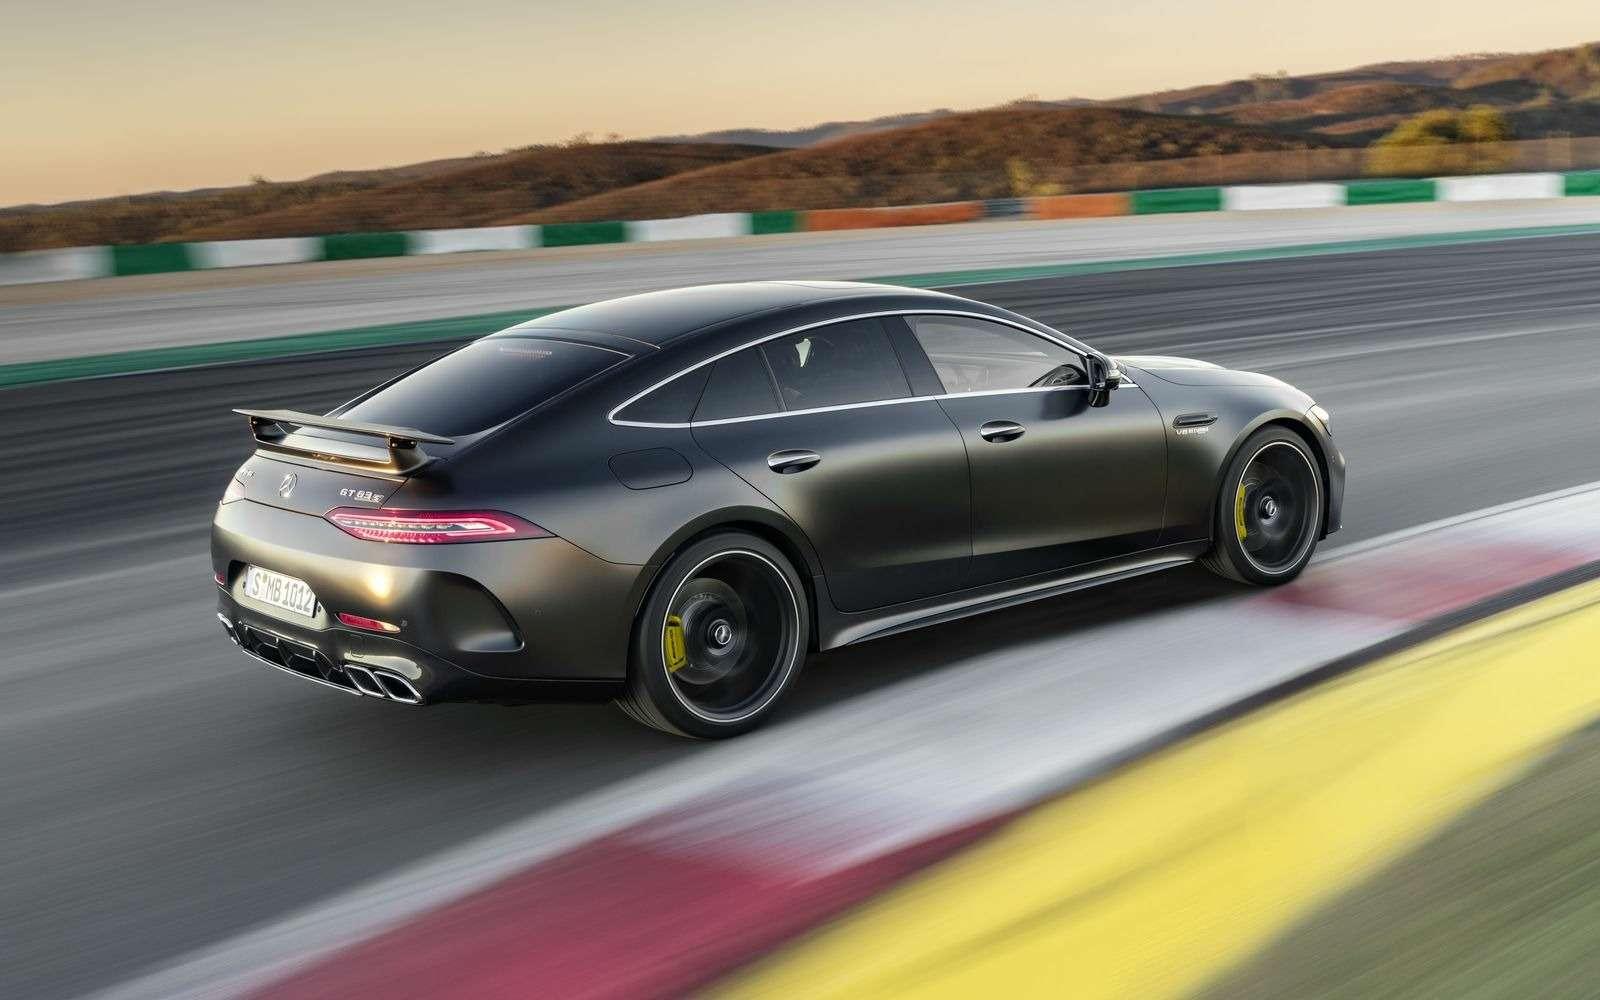 Подмена! Пятидверный Mercedes-AMG GTполучил «тележку» Е-класса— фото 851532